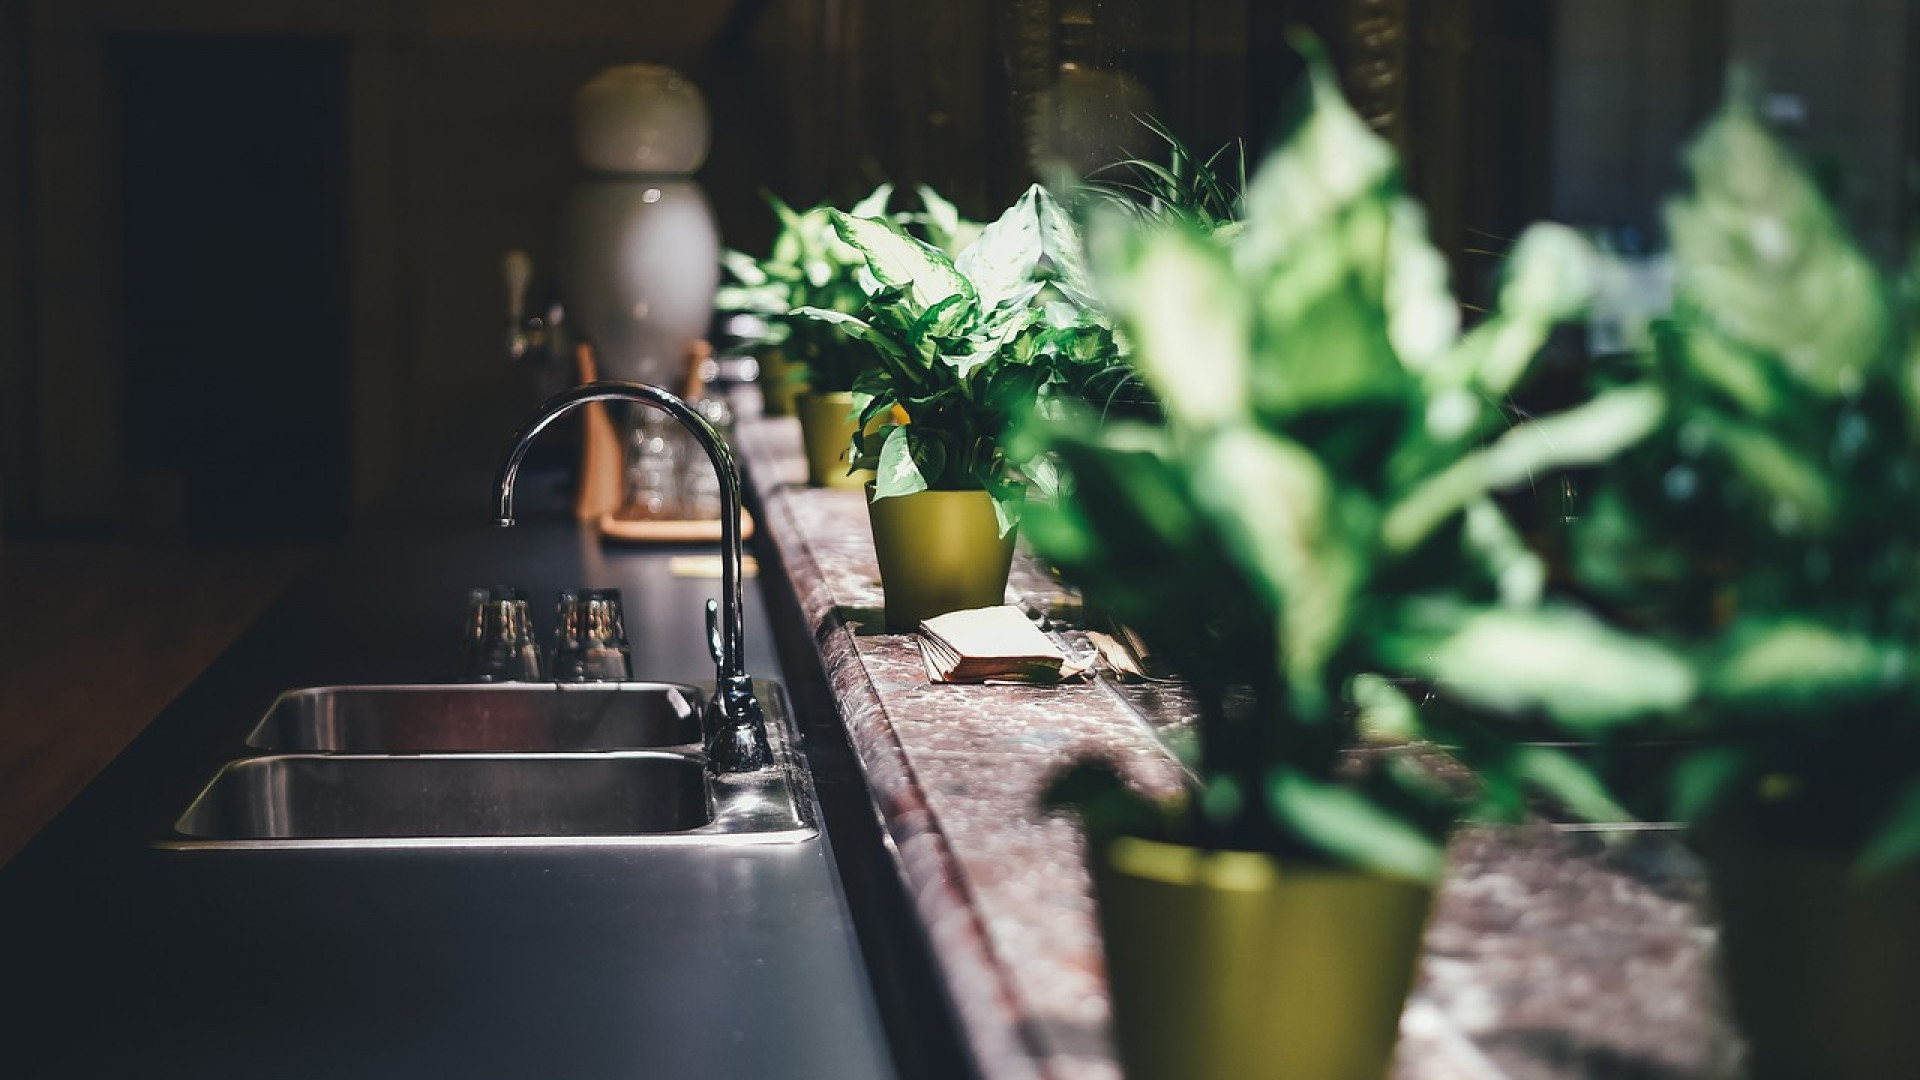 Concevoir sa cuisine en quelques clics !